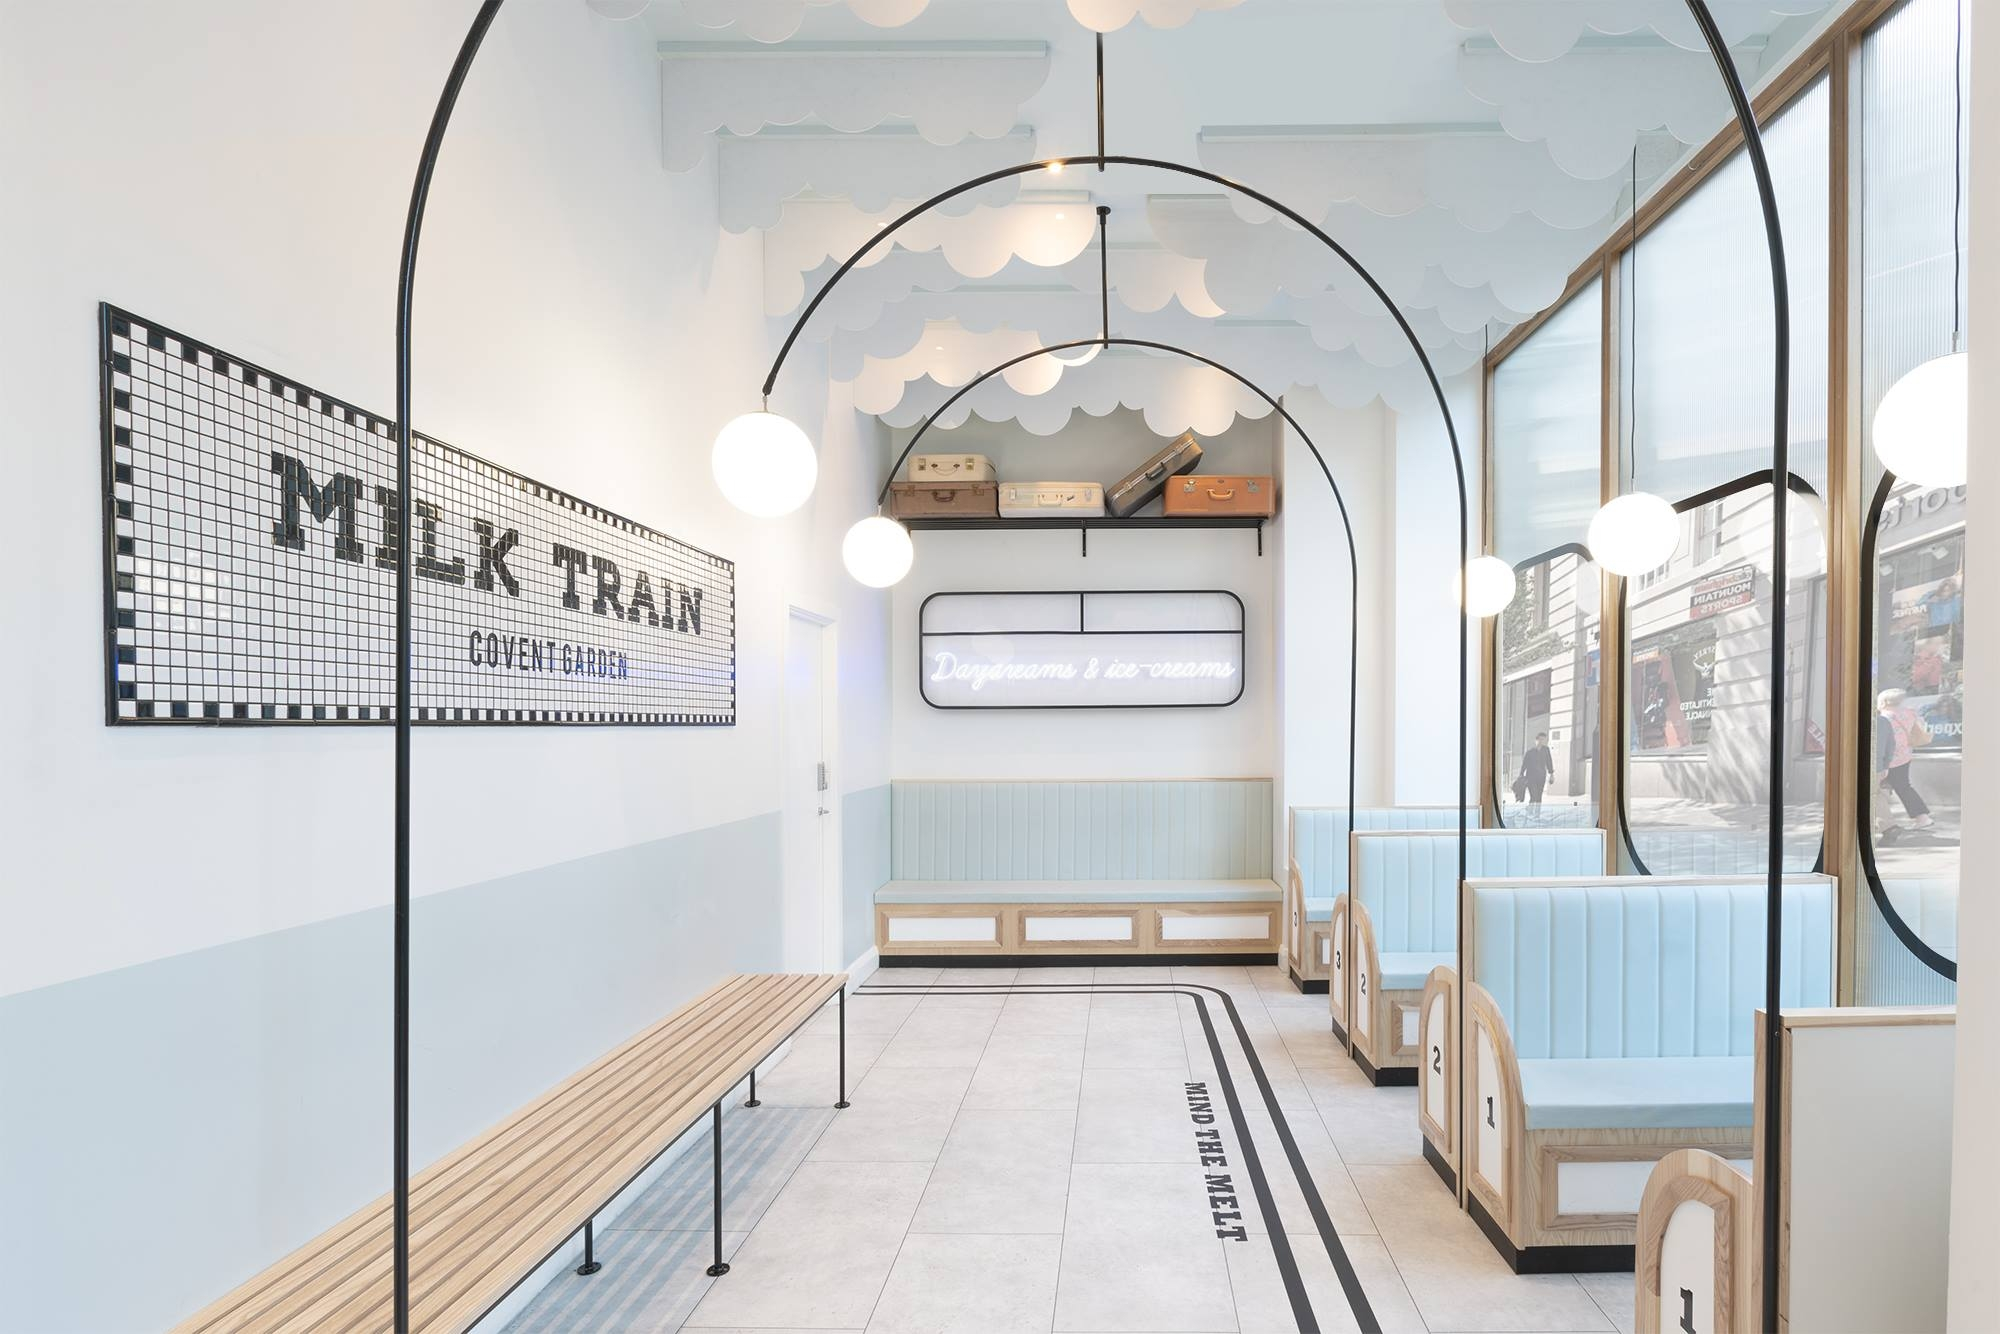 Milk Train Art Deco interior by FormRoom